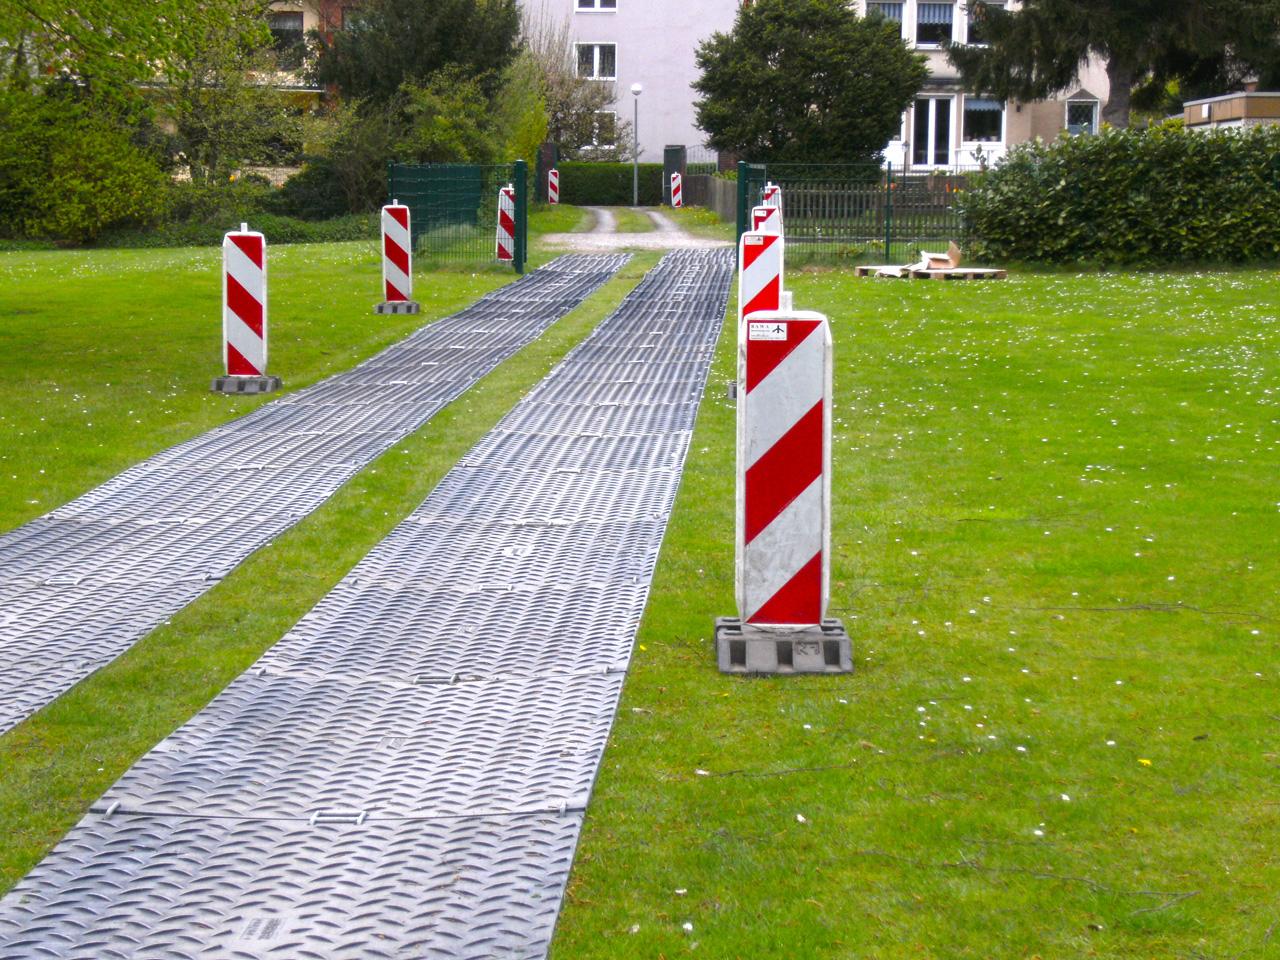 Baustraße-Bodenschutz